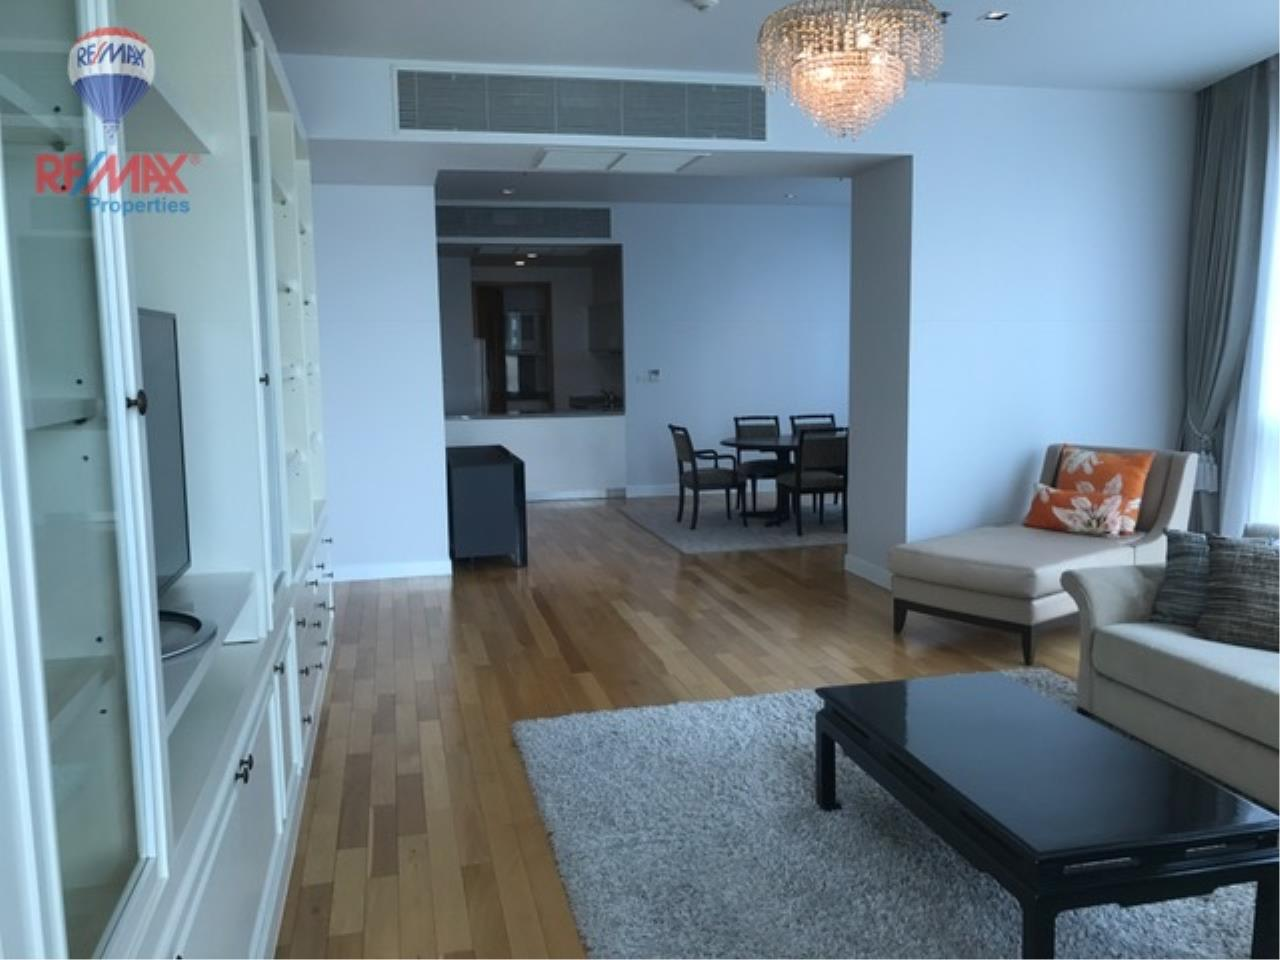 1 Bedroom At Millennuim Residence Sukhumvit Rentmillennium Residence 3 1 Bedroom 193 Sqm For Rent Prakard